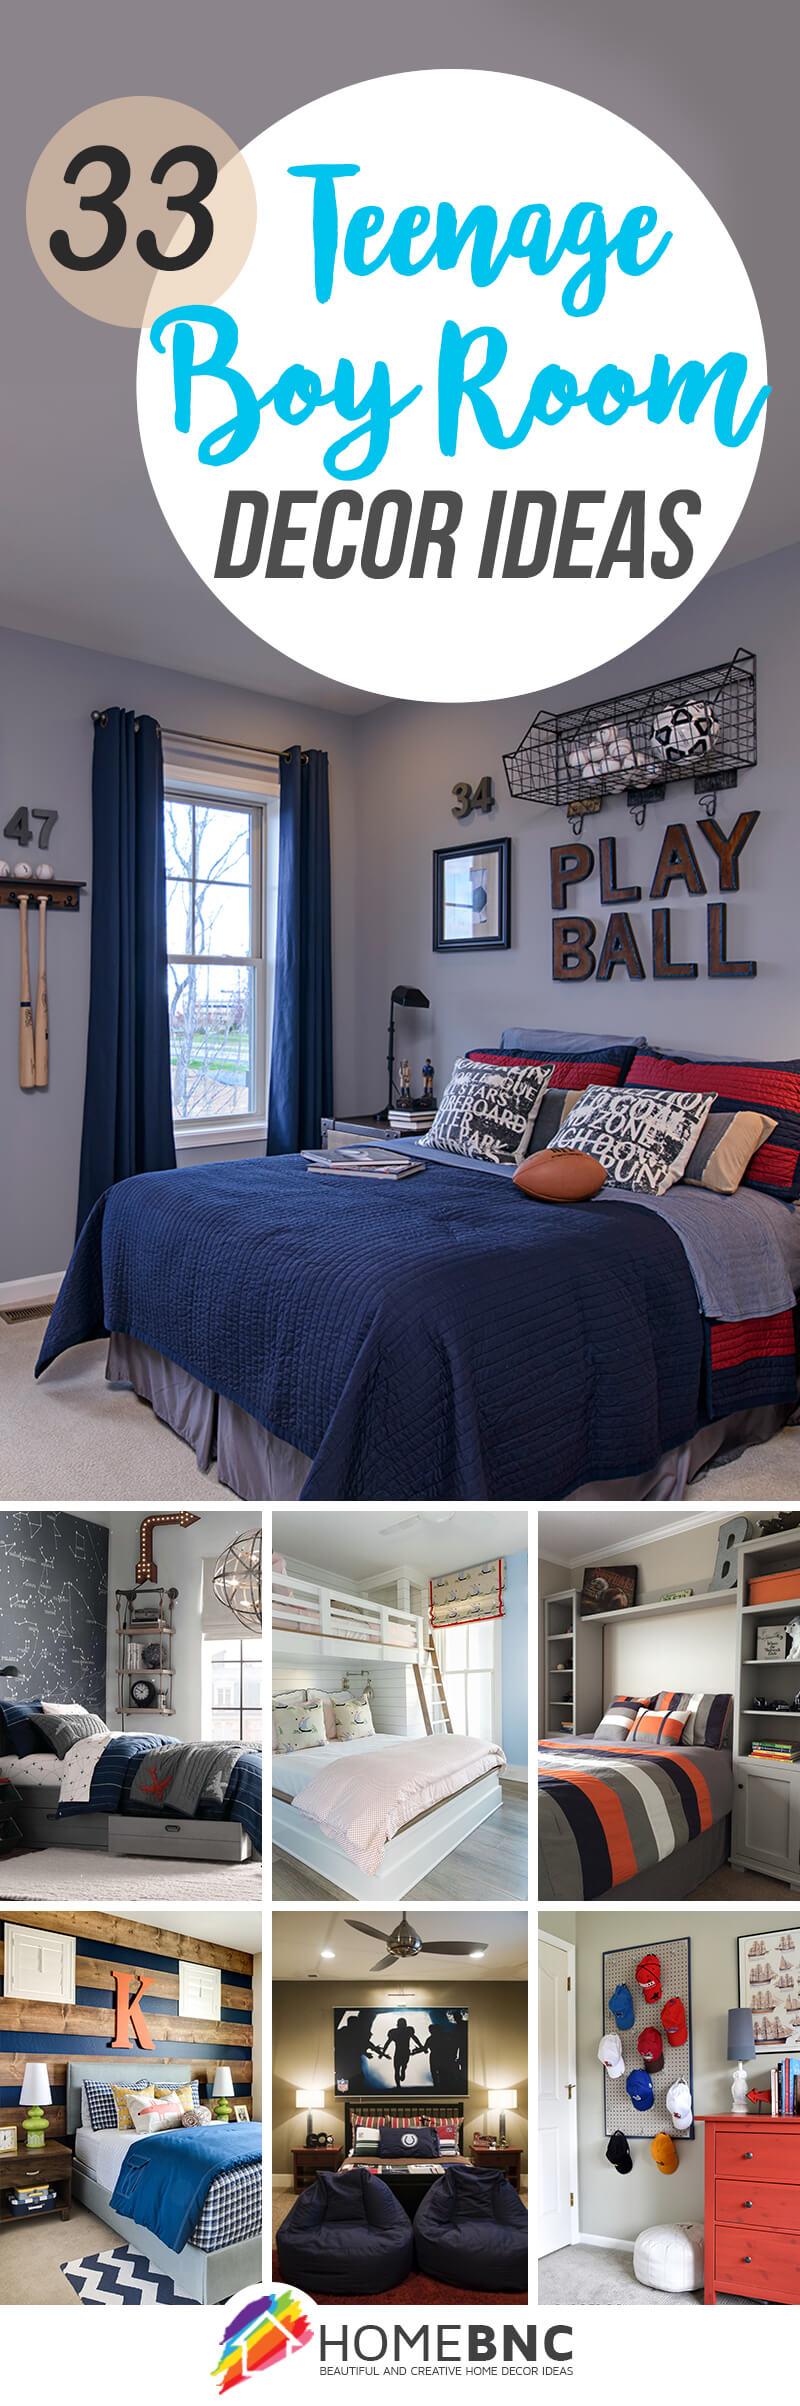 Teenage Boy Room Decor Ideas Pinterest Share Homebnc Homebnc